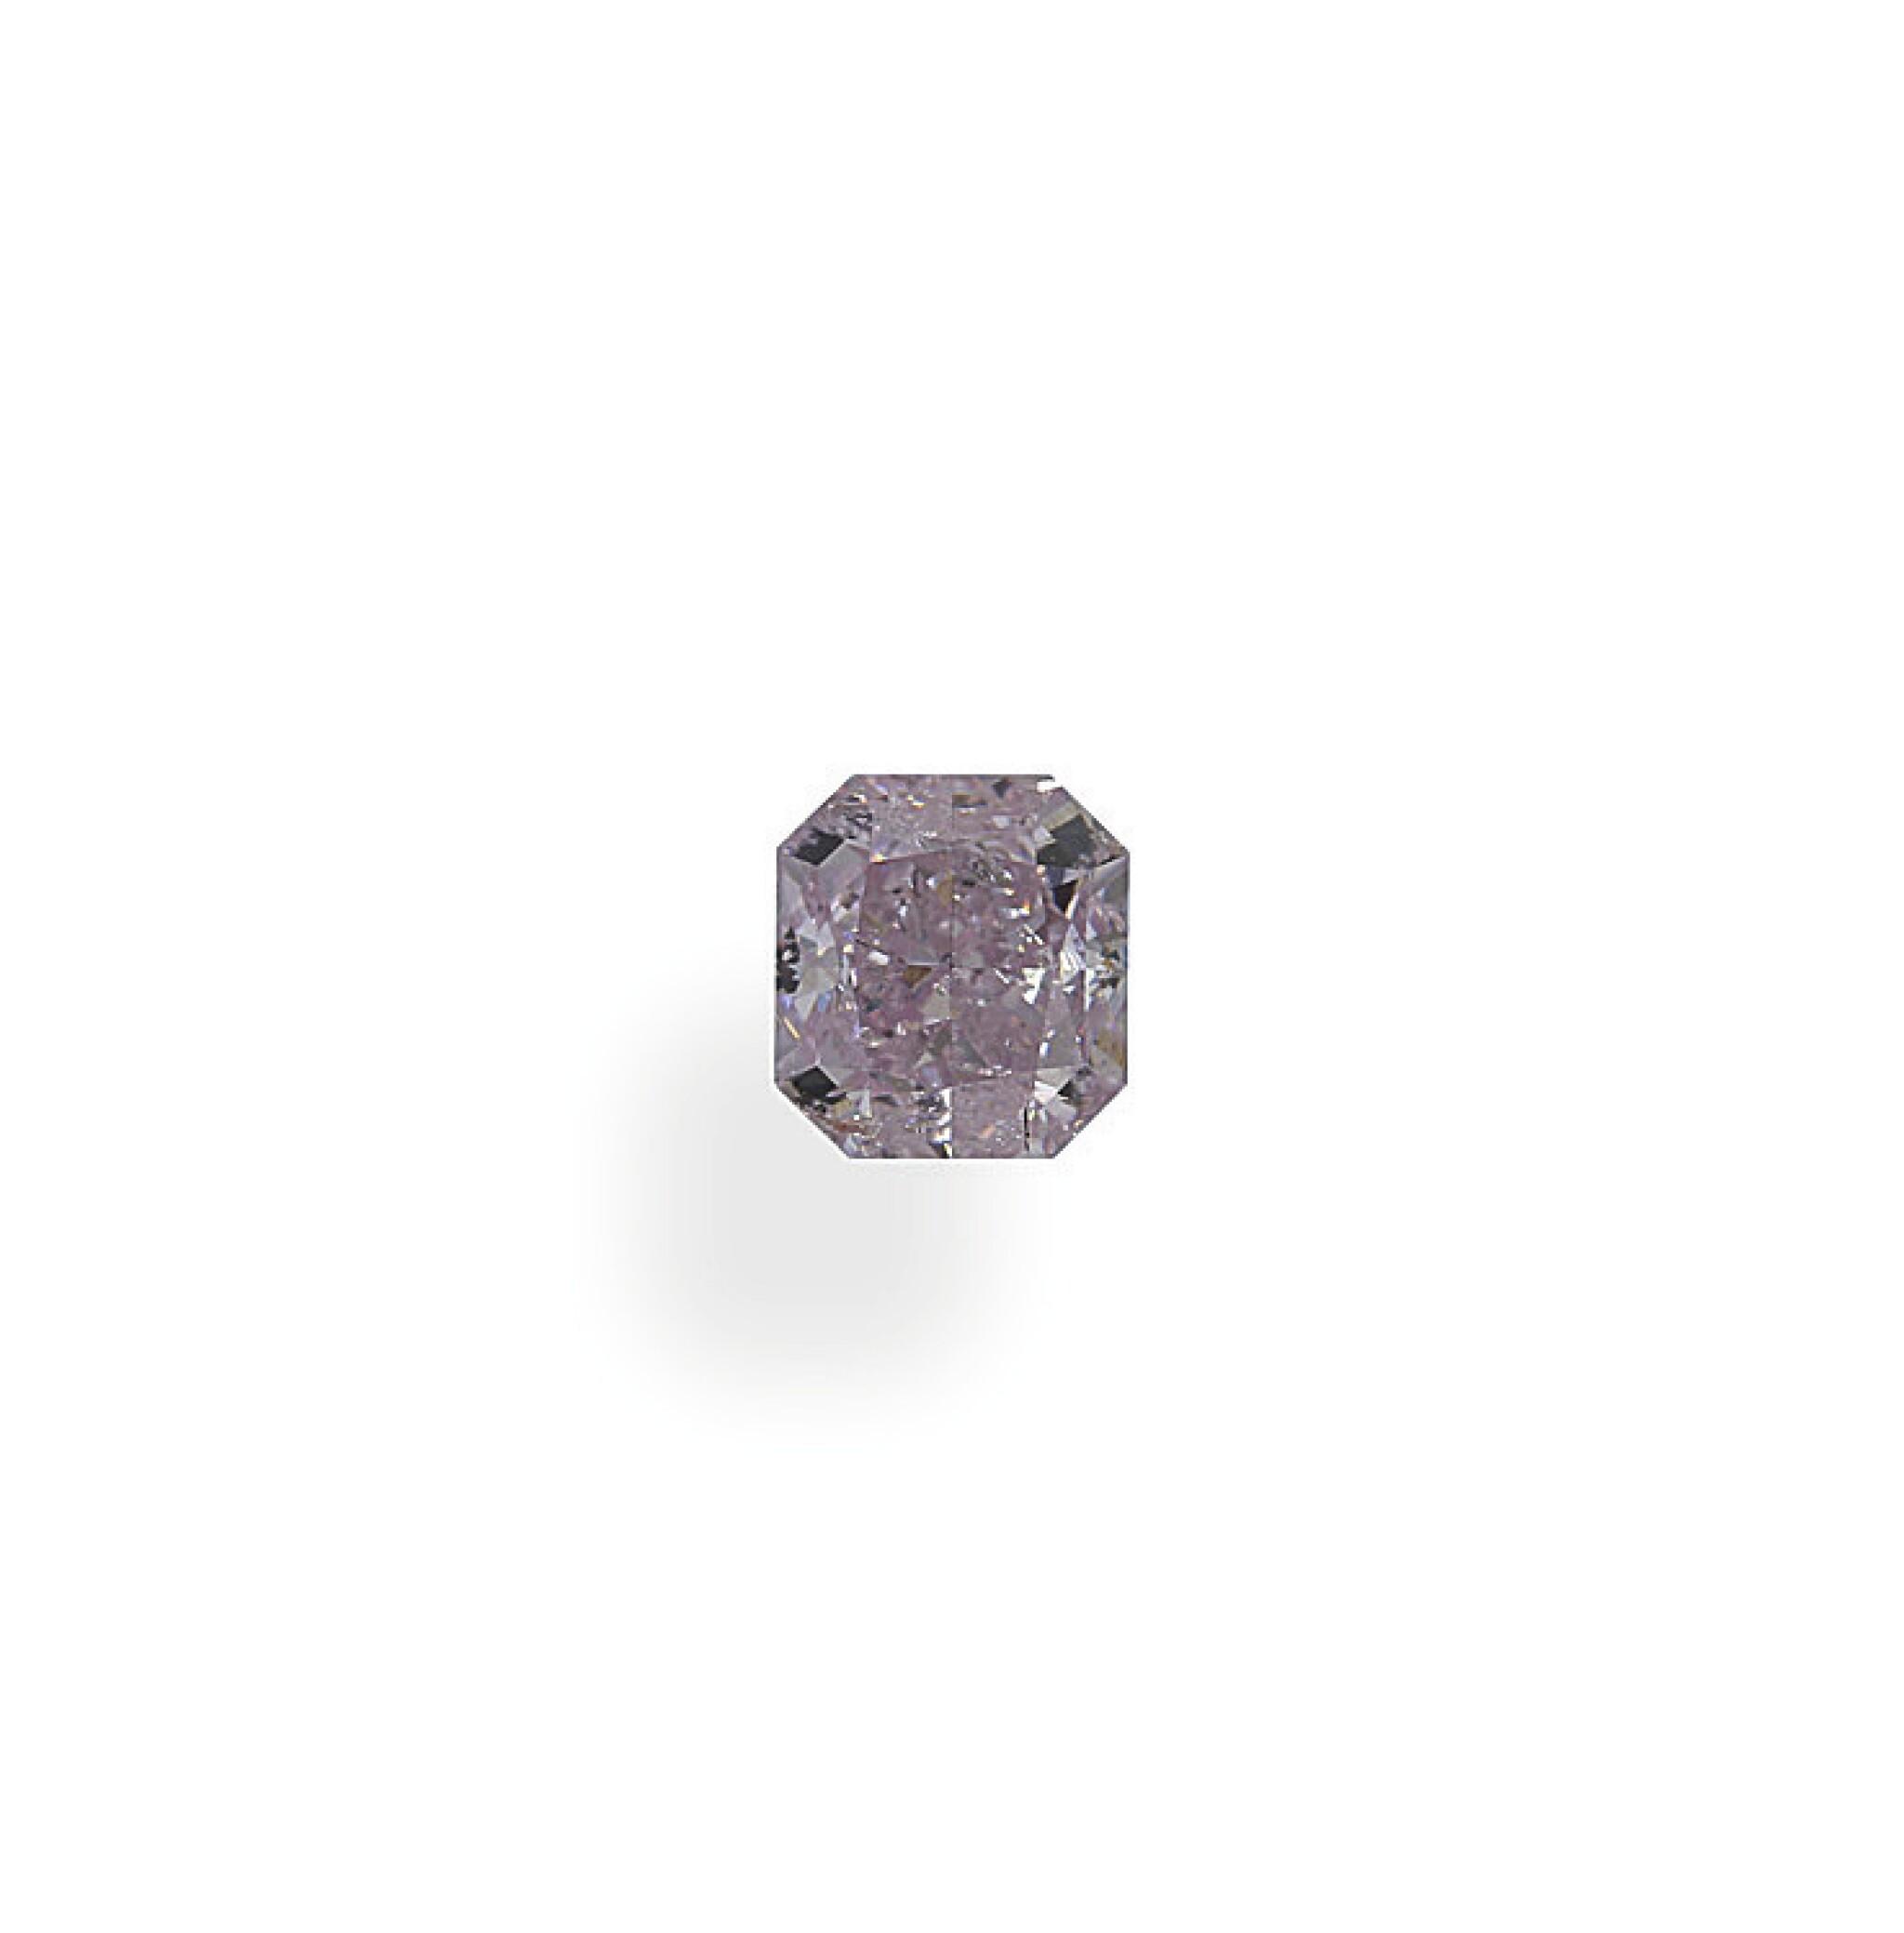 View full screen - View 1 of Lot 18. A 0.47 Carat Fancy Purplish Pink Cut-Cornered Rectangular Modified Brilliant-Cut Diamond.